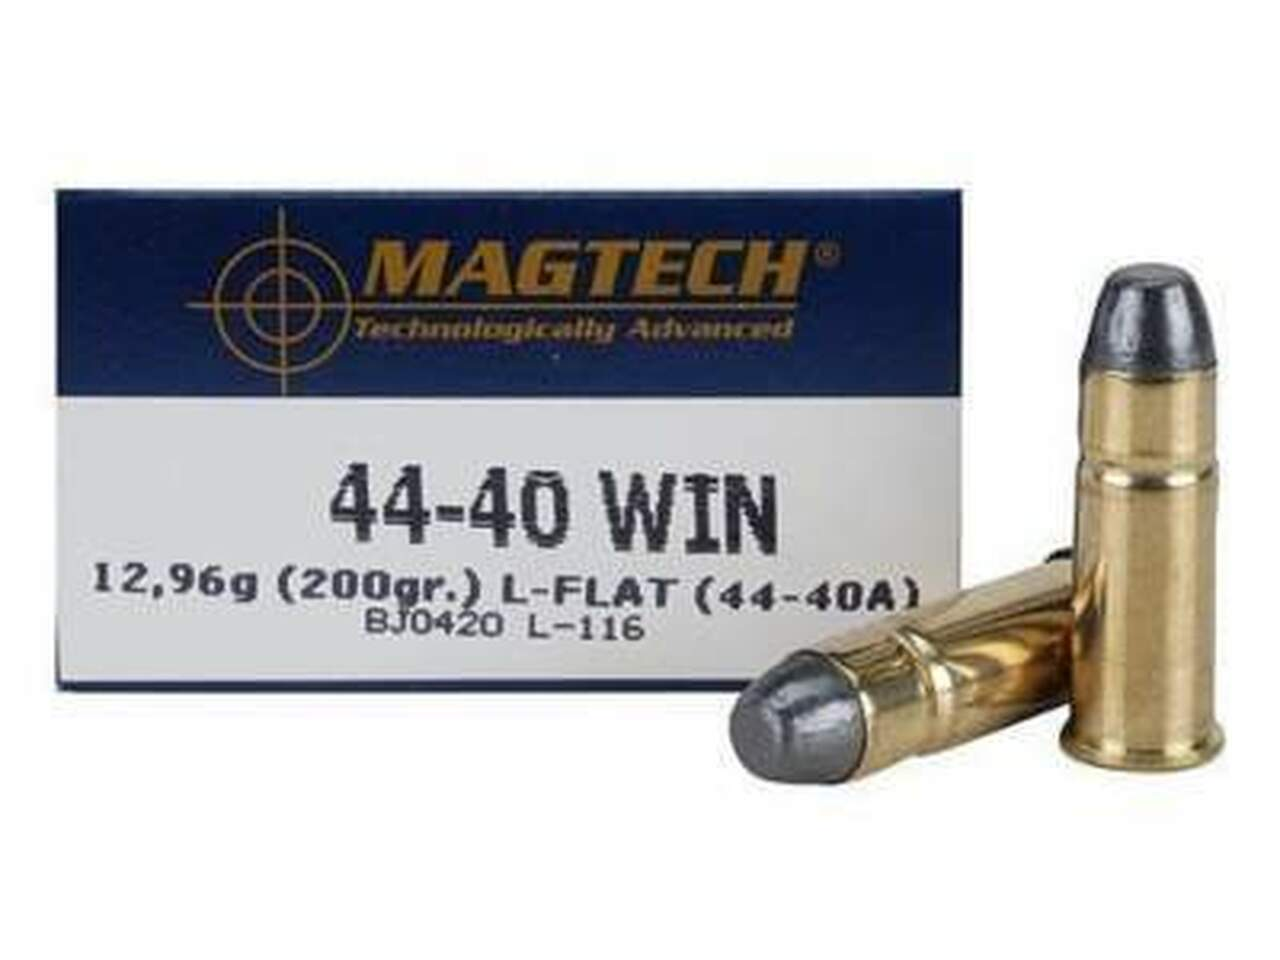 44-40 Win Ammo